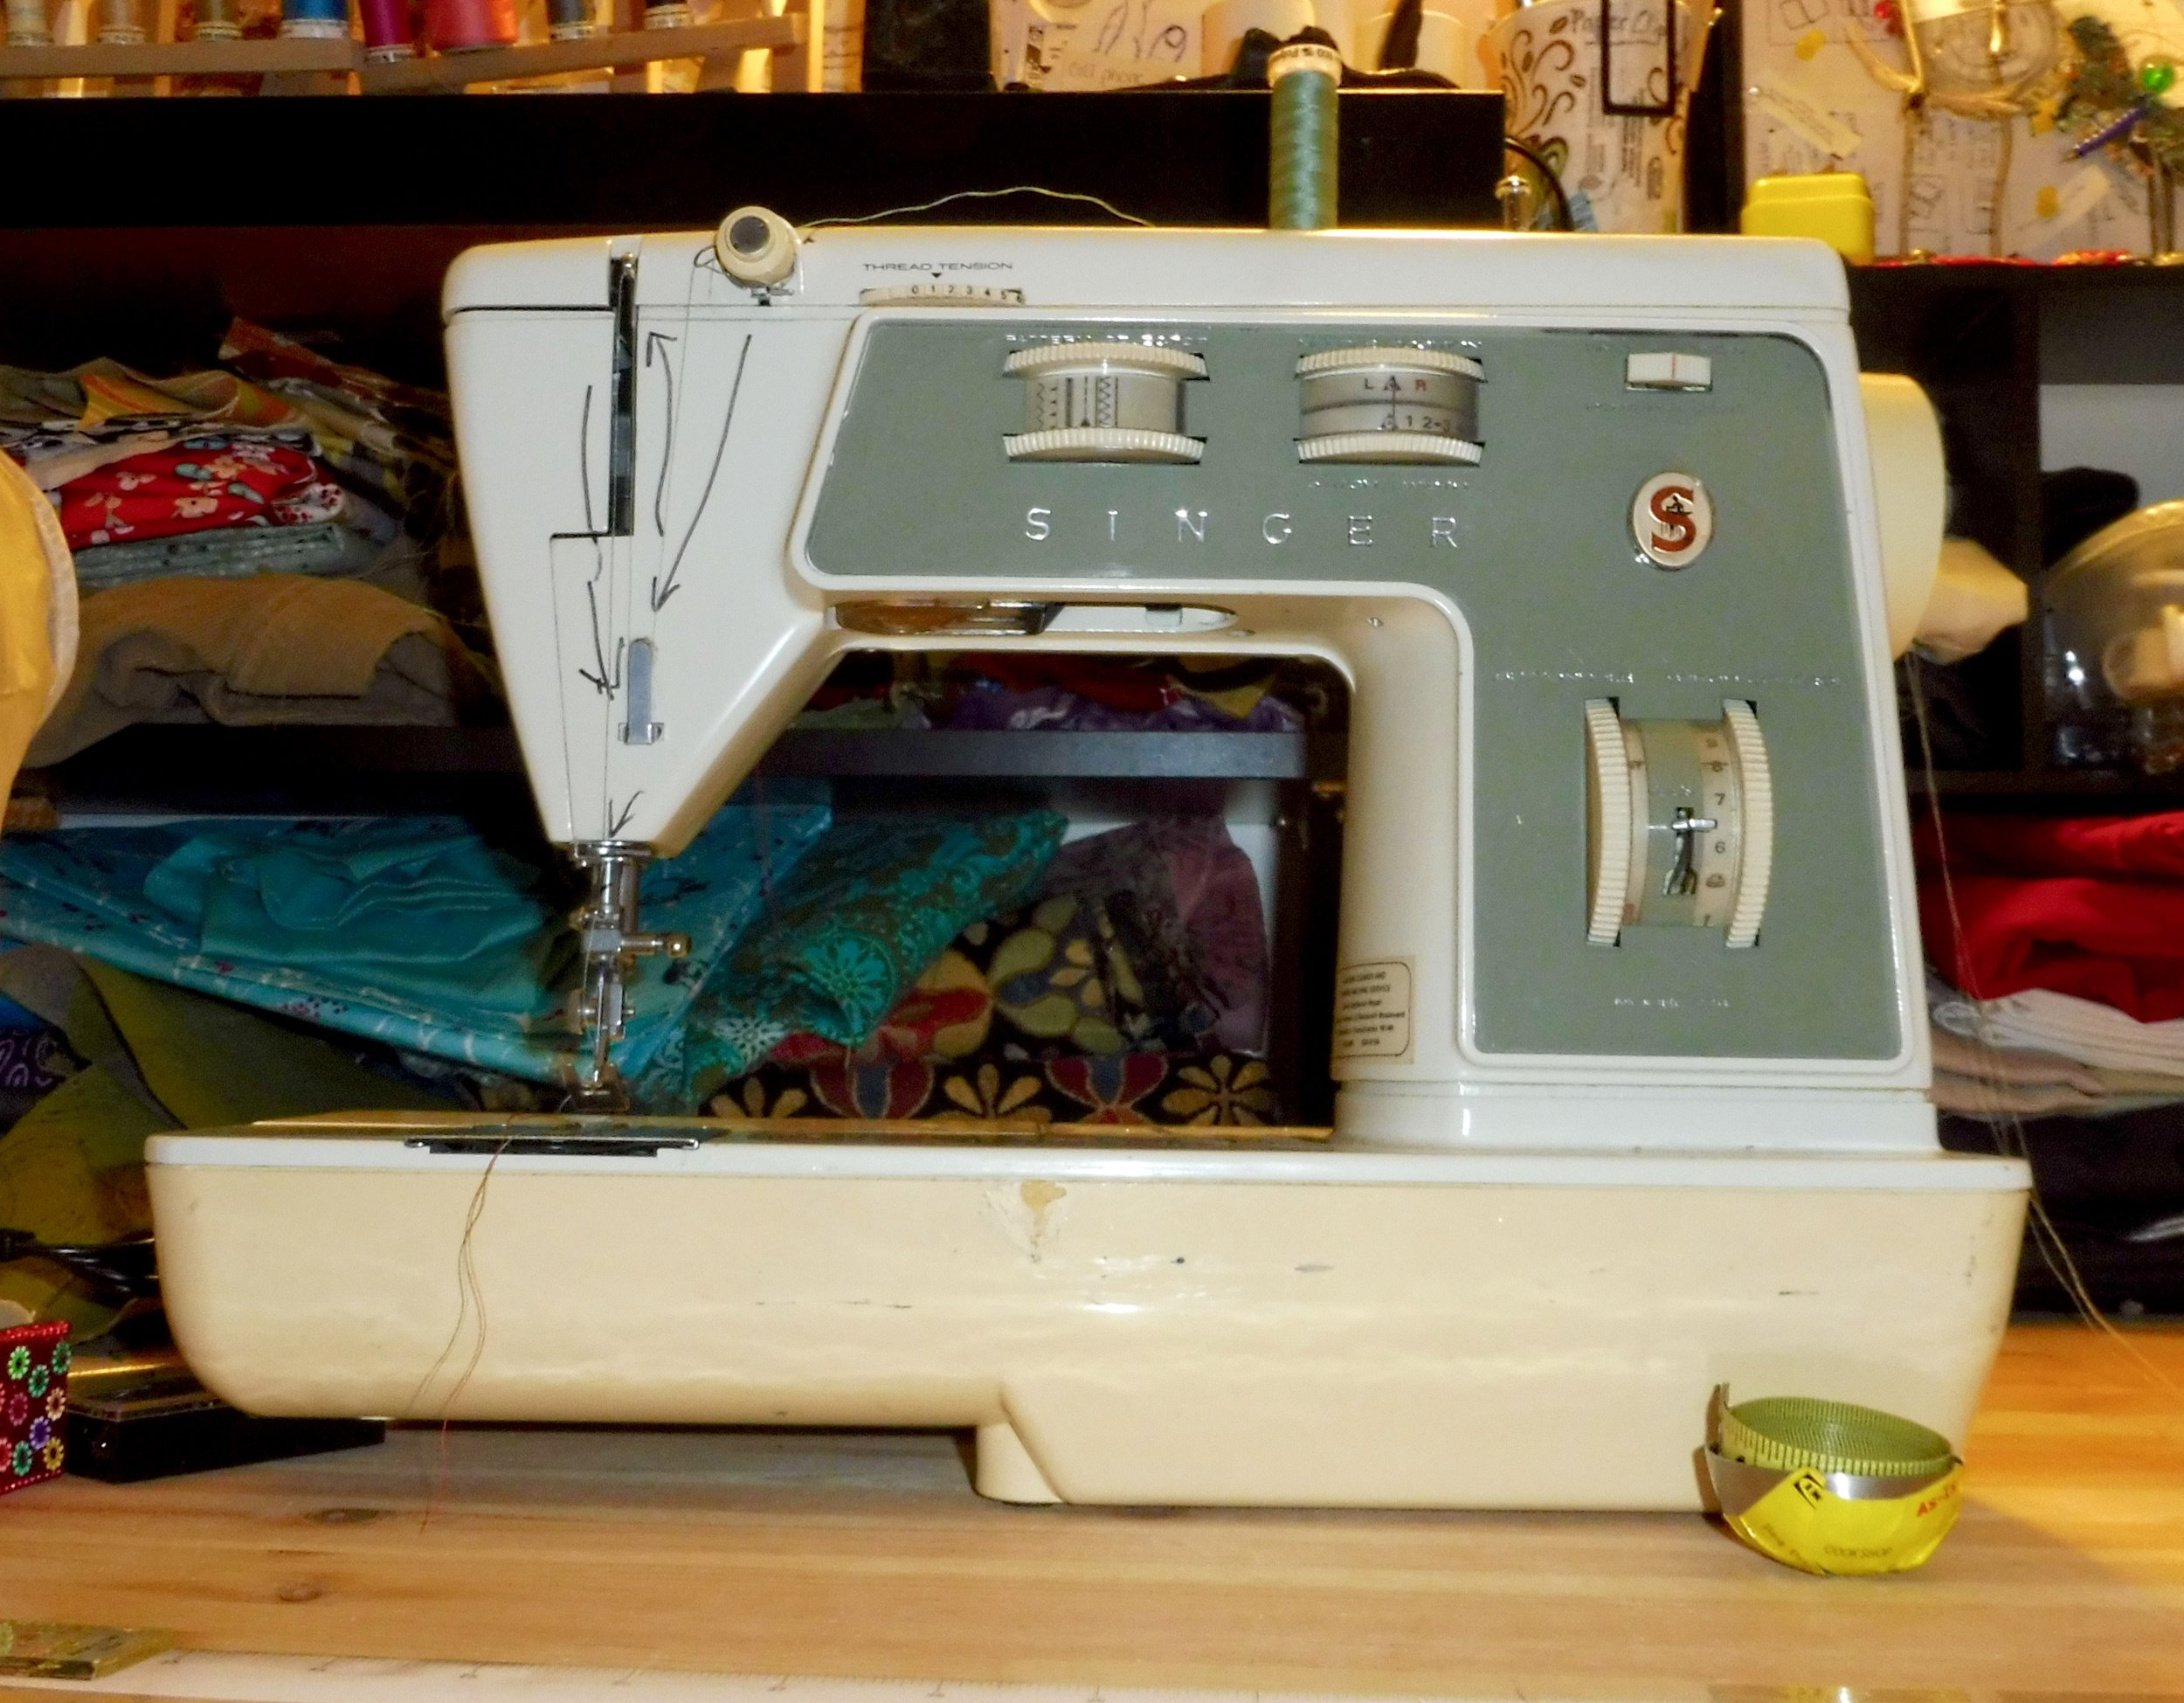 Circa 1973-1978, my mom's machine. AKA: The Beast